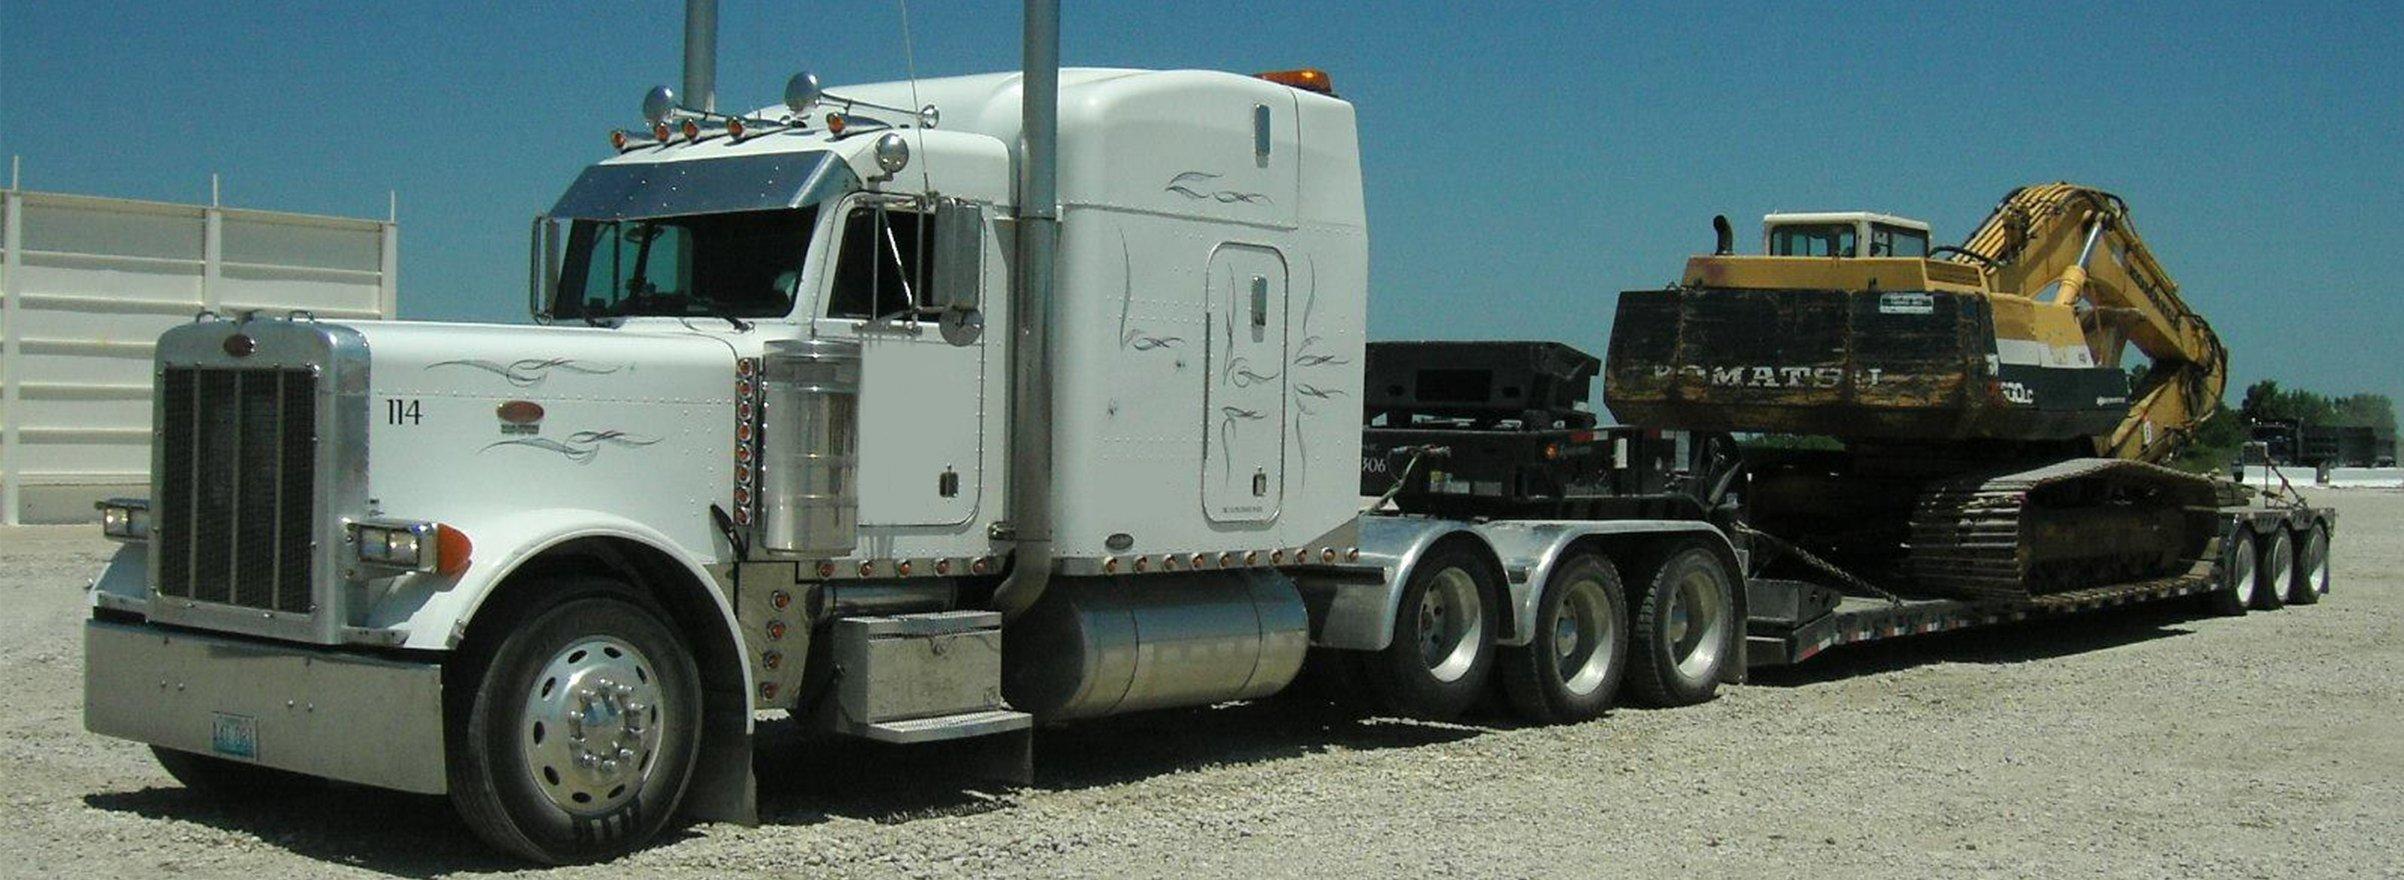 White semi with step deck trailor hauling a crane